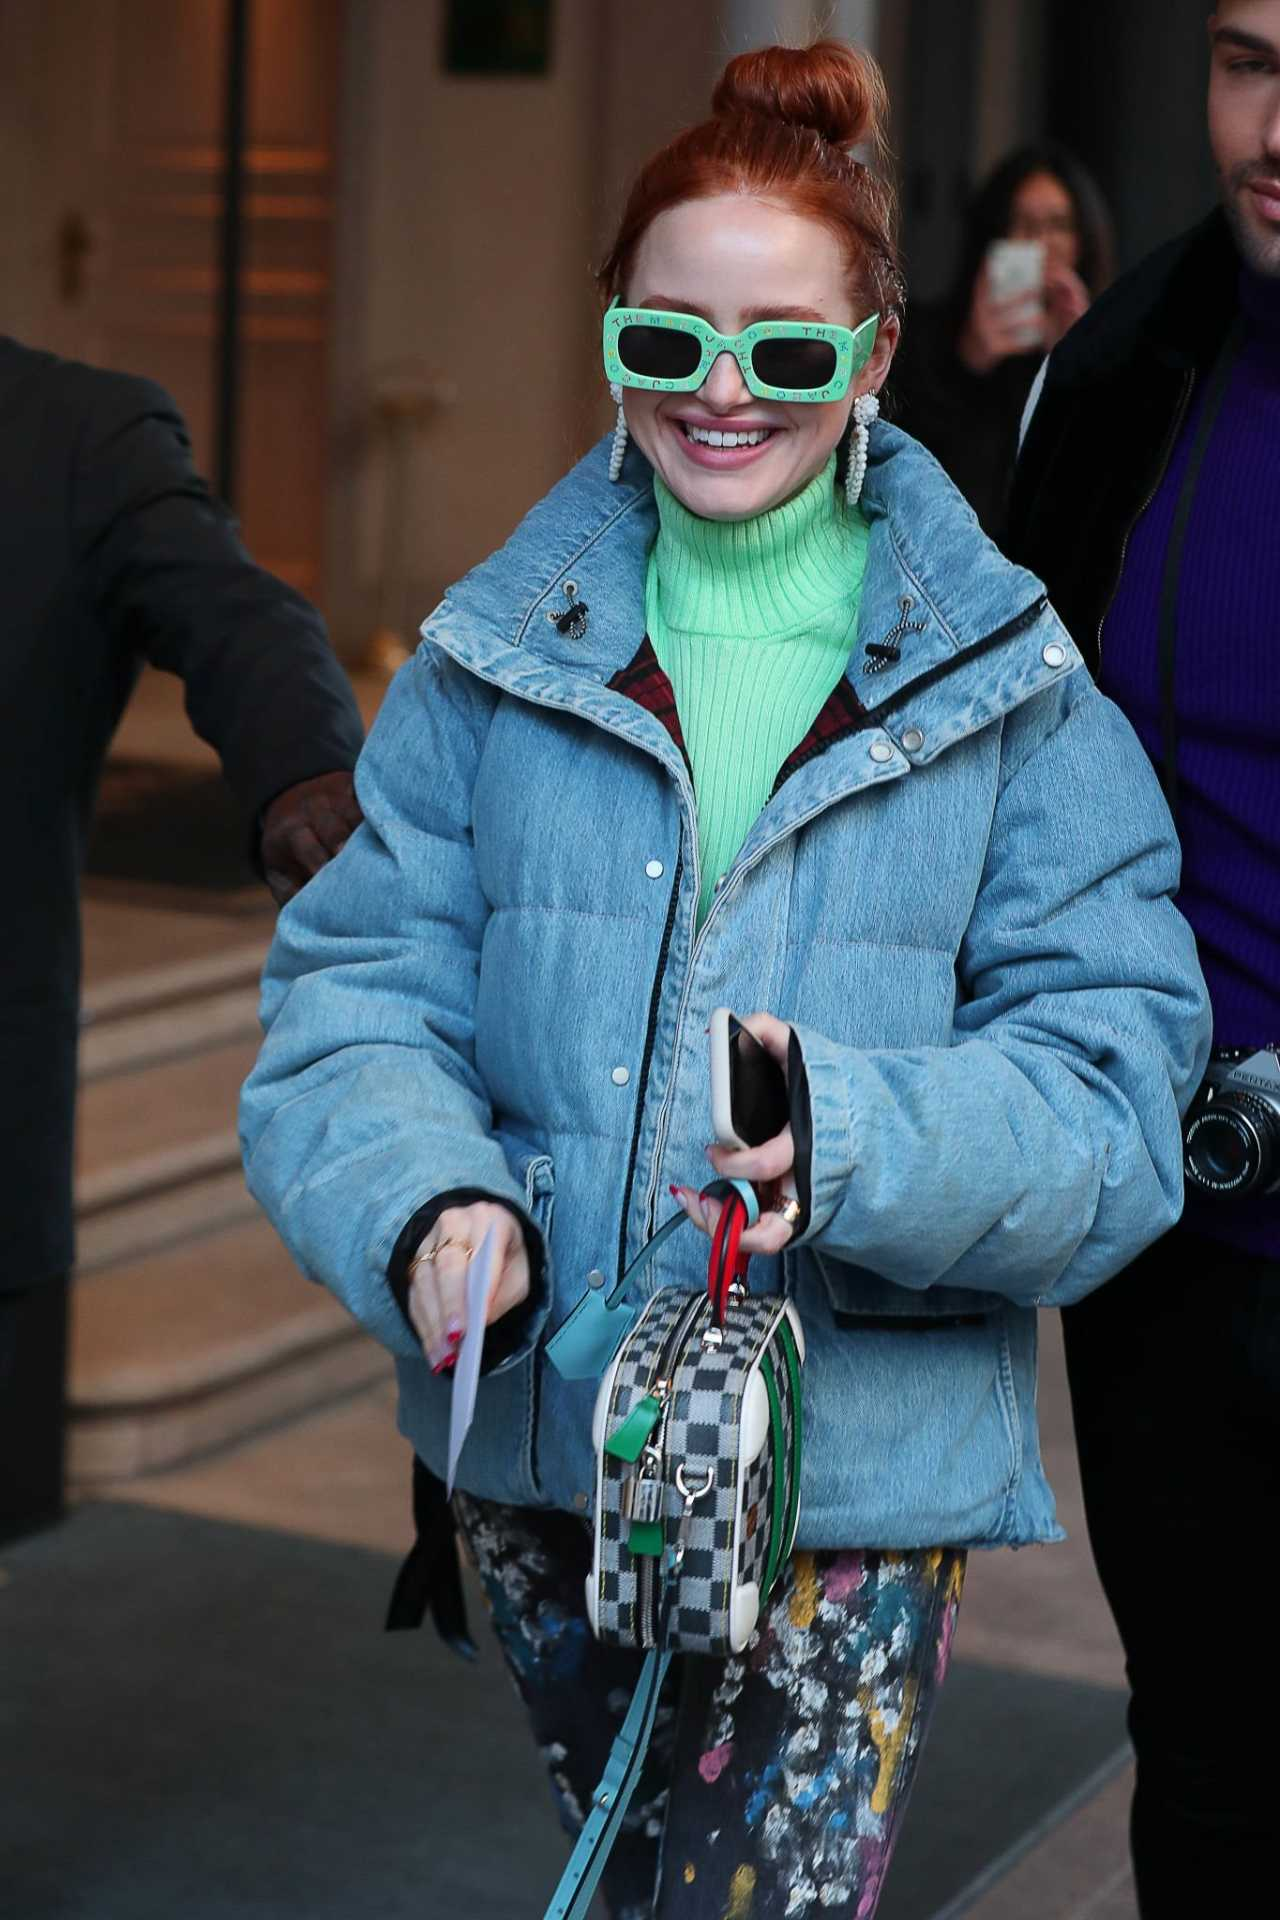 Madelaine Petsch - All smiles in Milan during fashion week